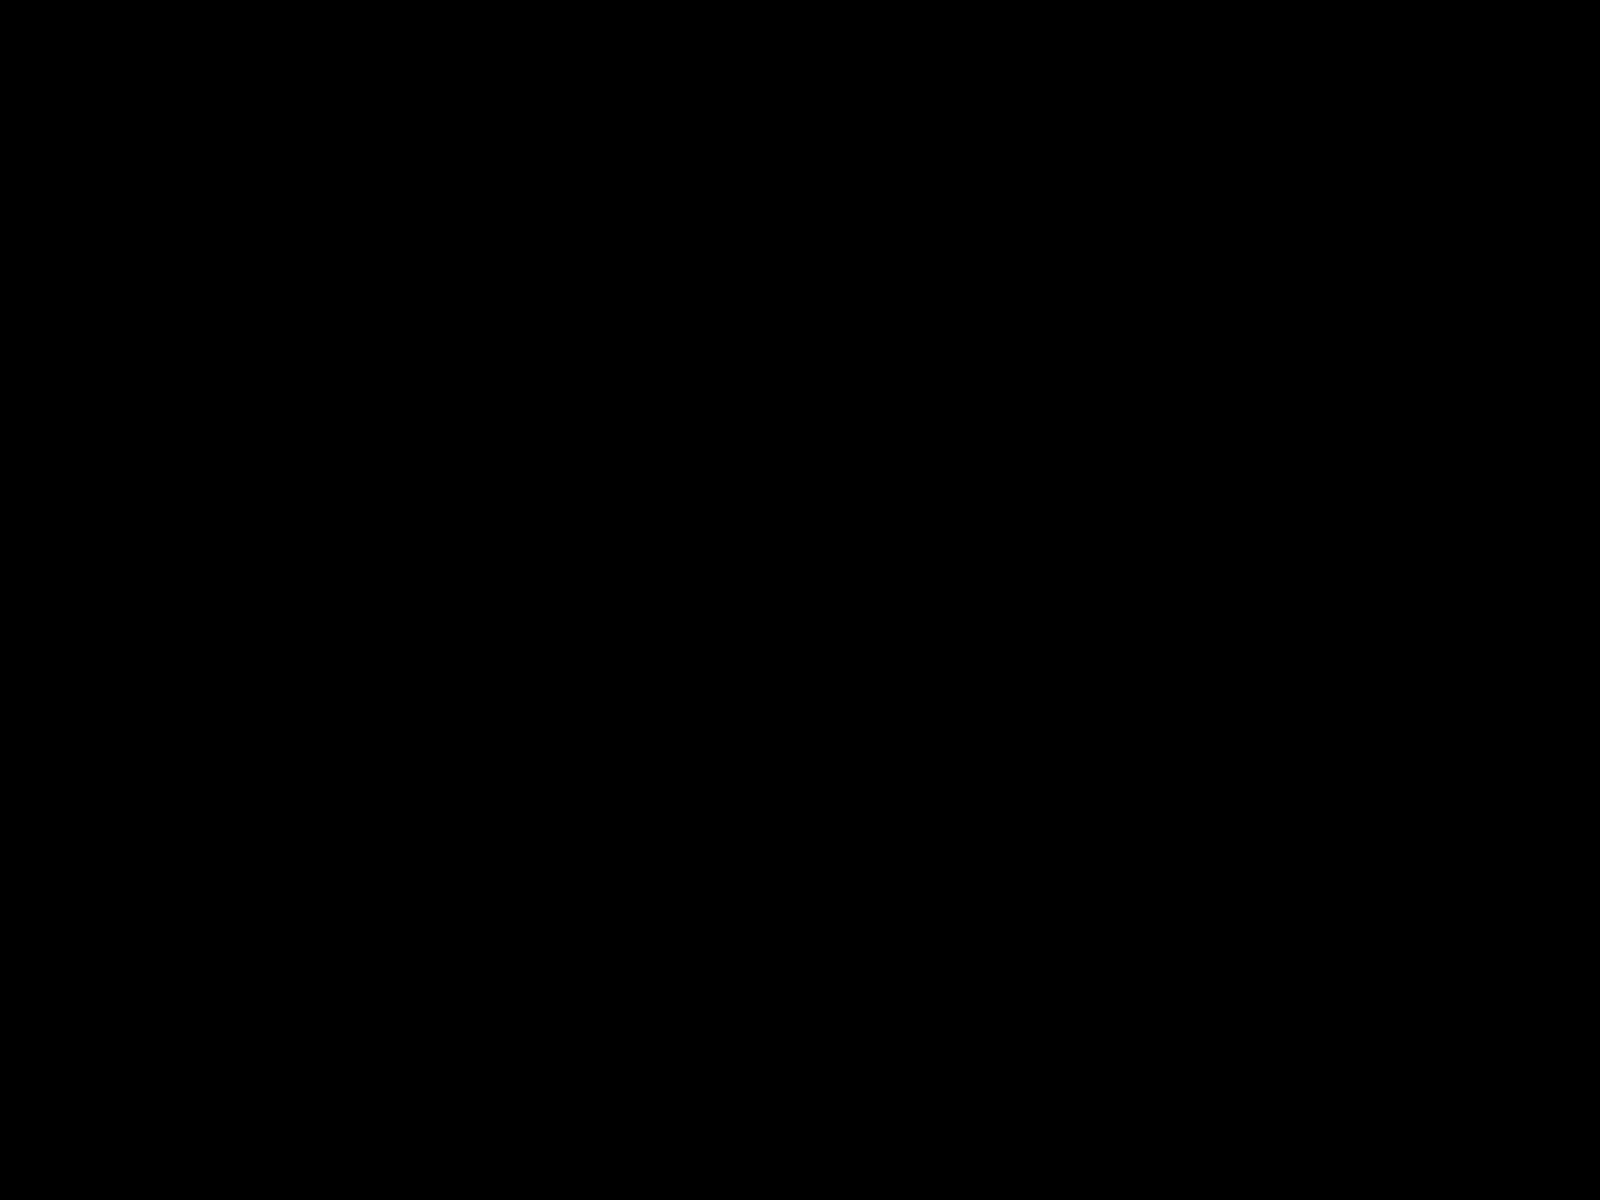 Banestatus 19.10.2017